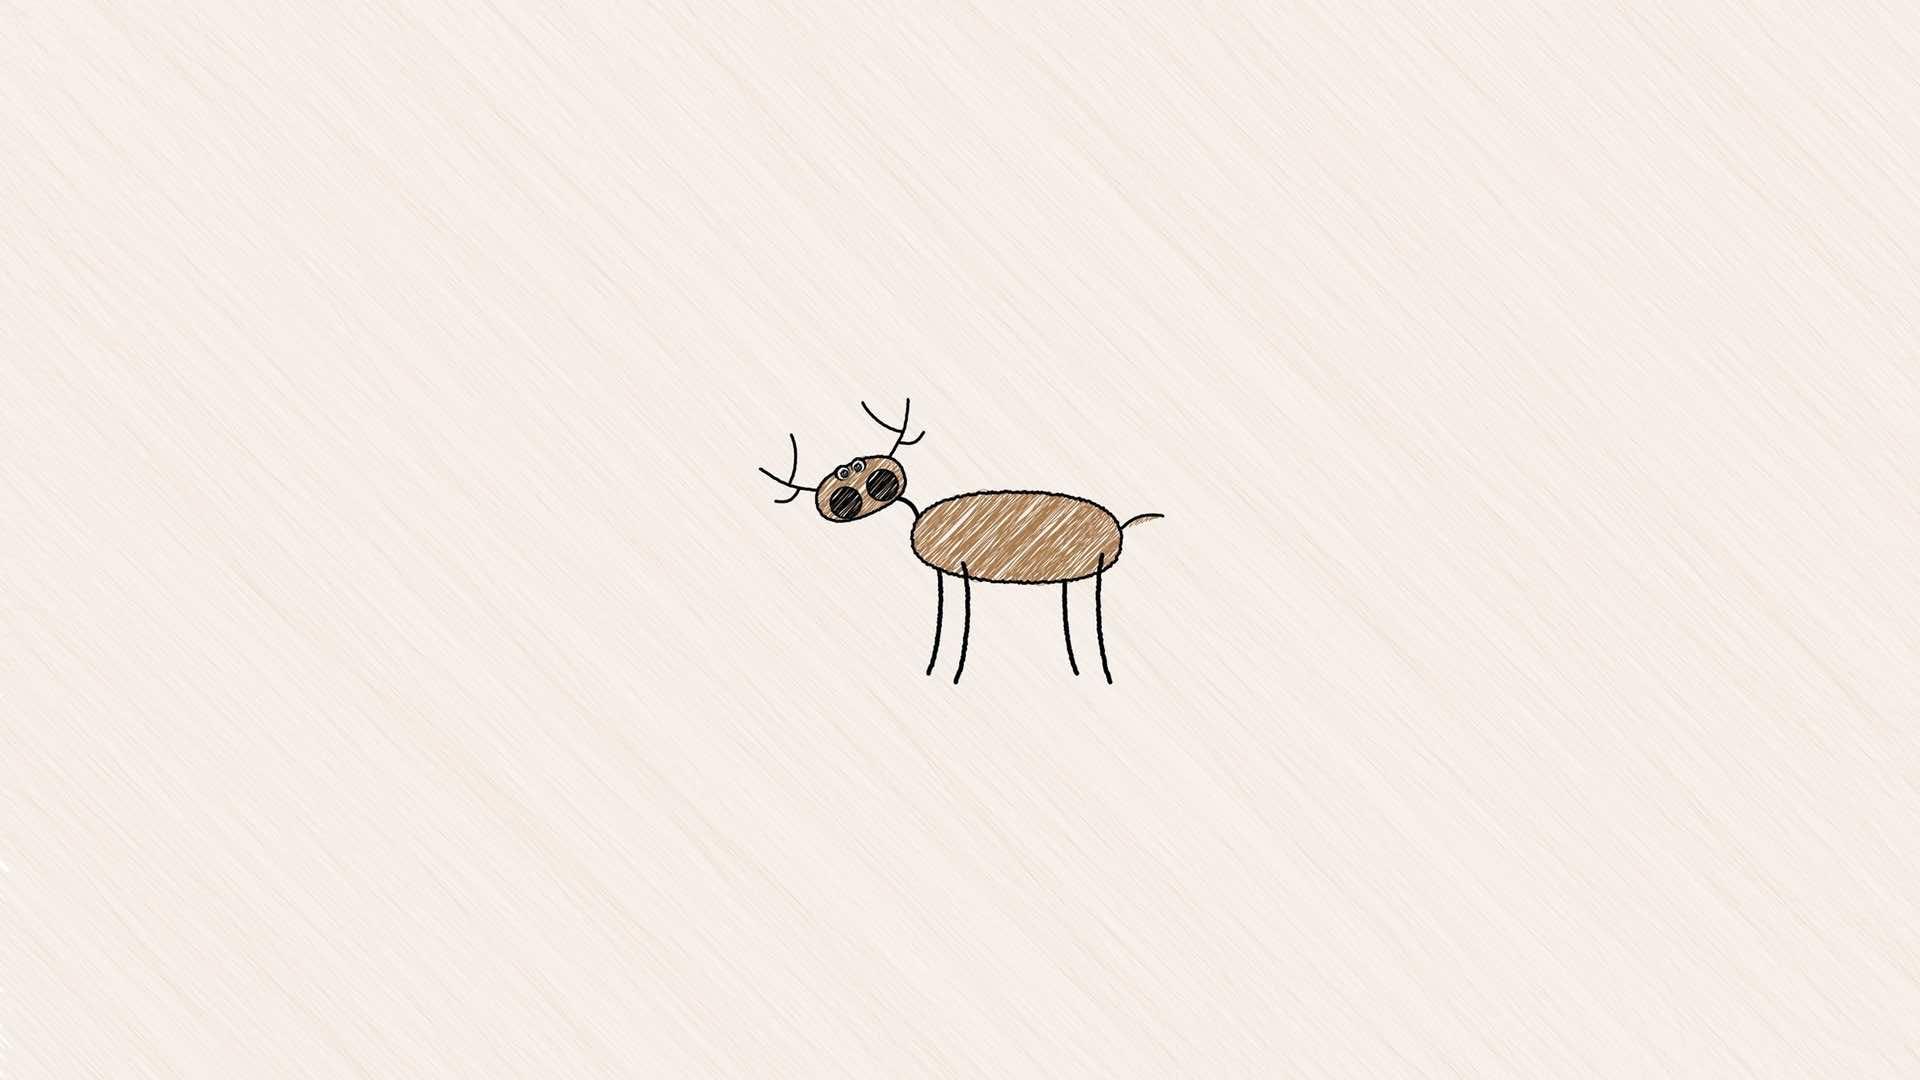 110 free desktop wallpaper backgrounds for free download for Define minimalist